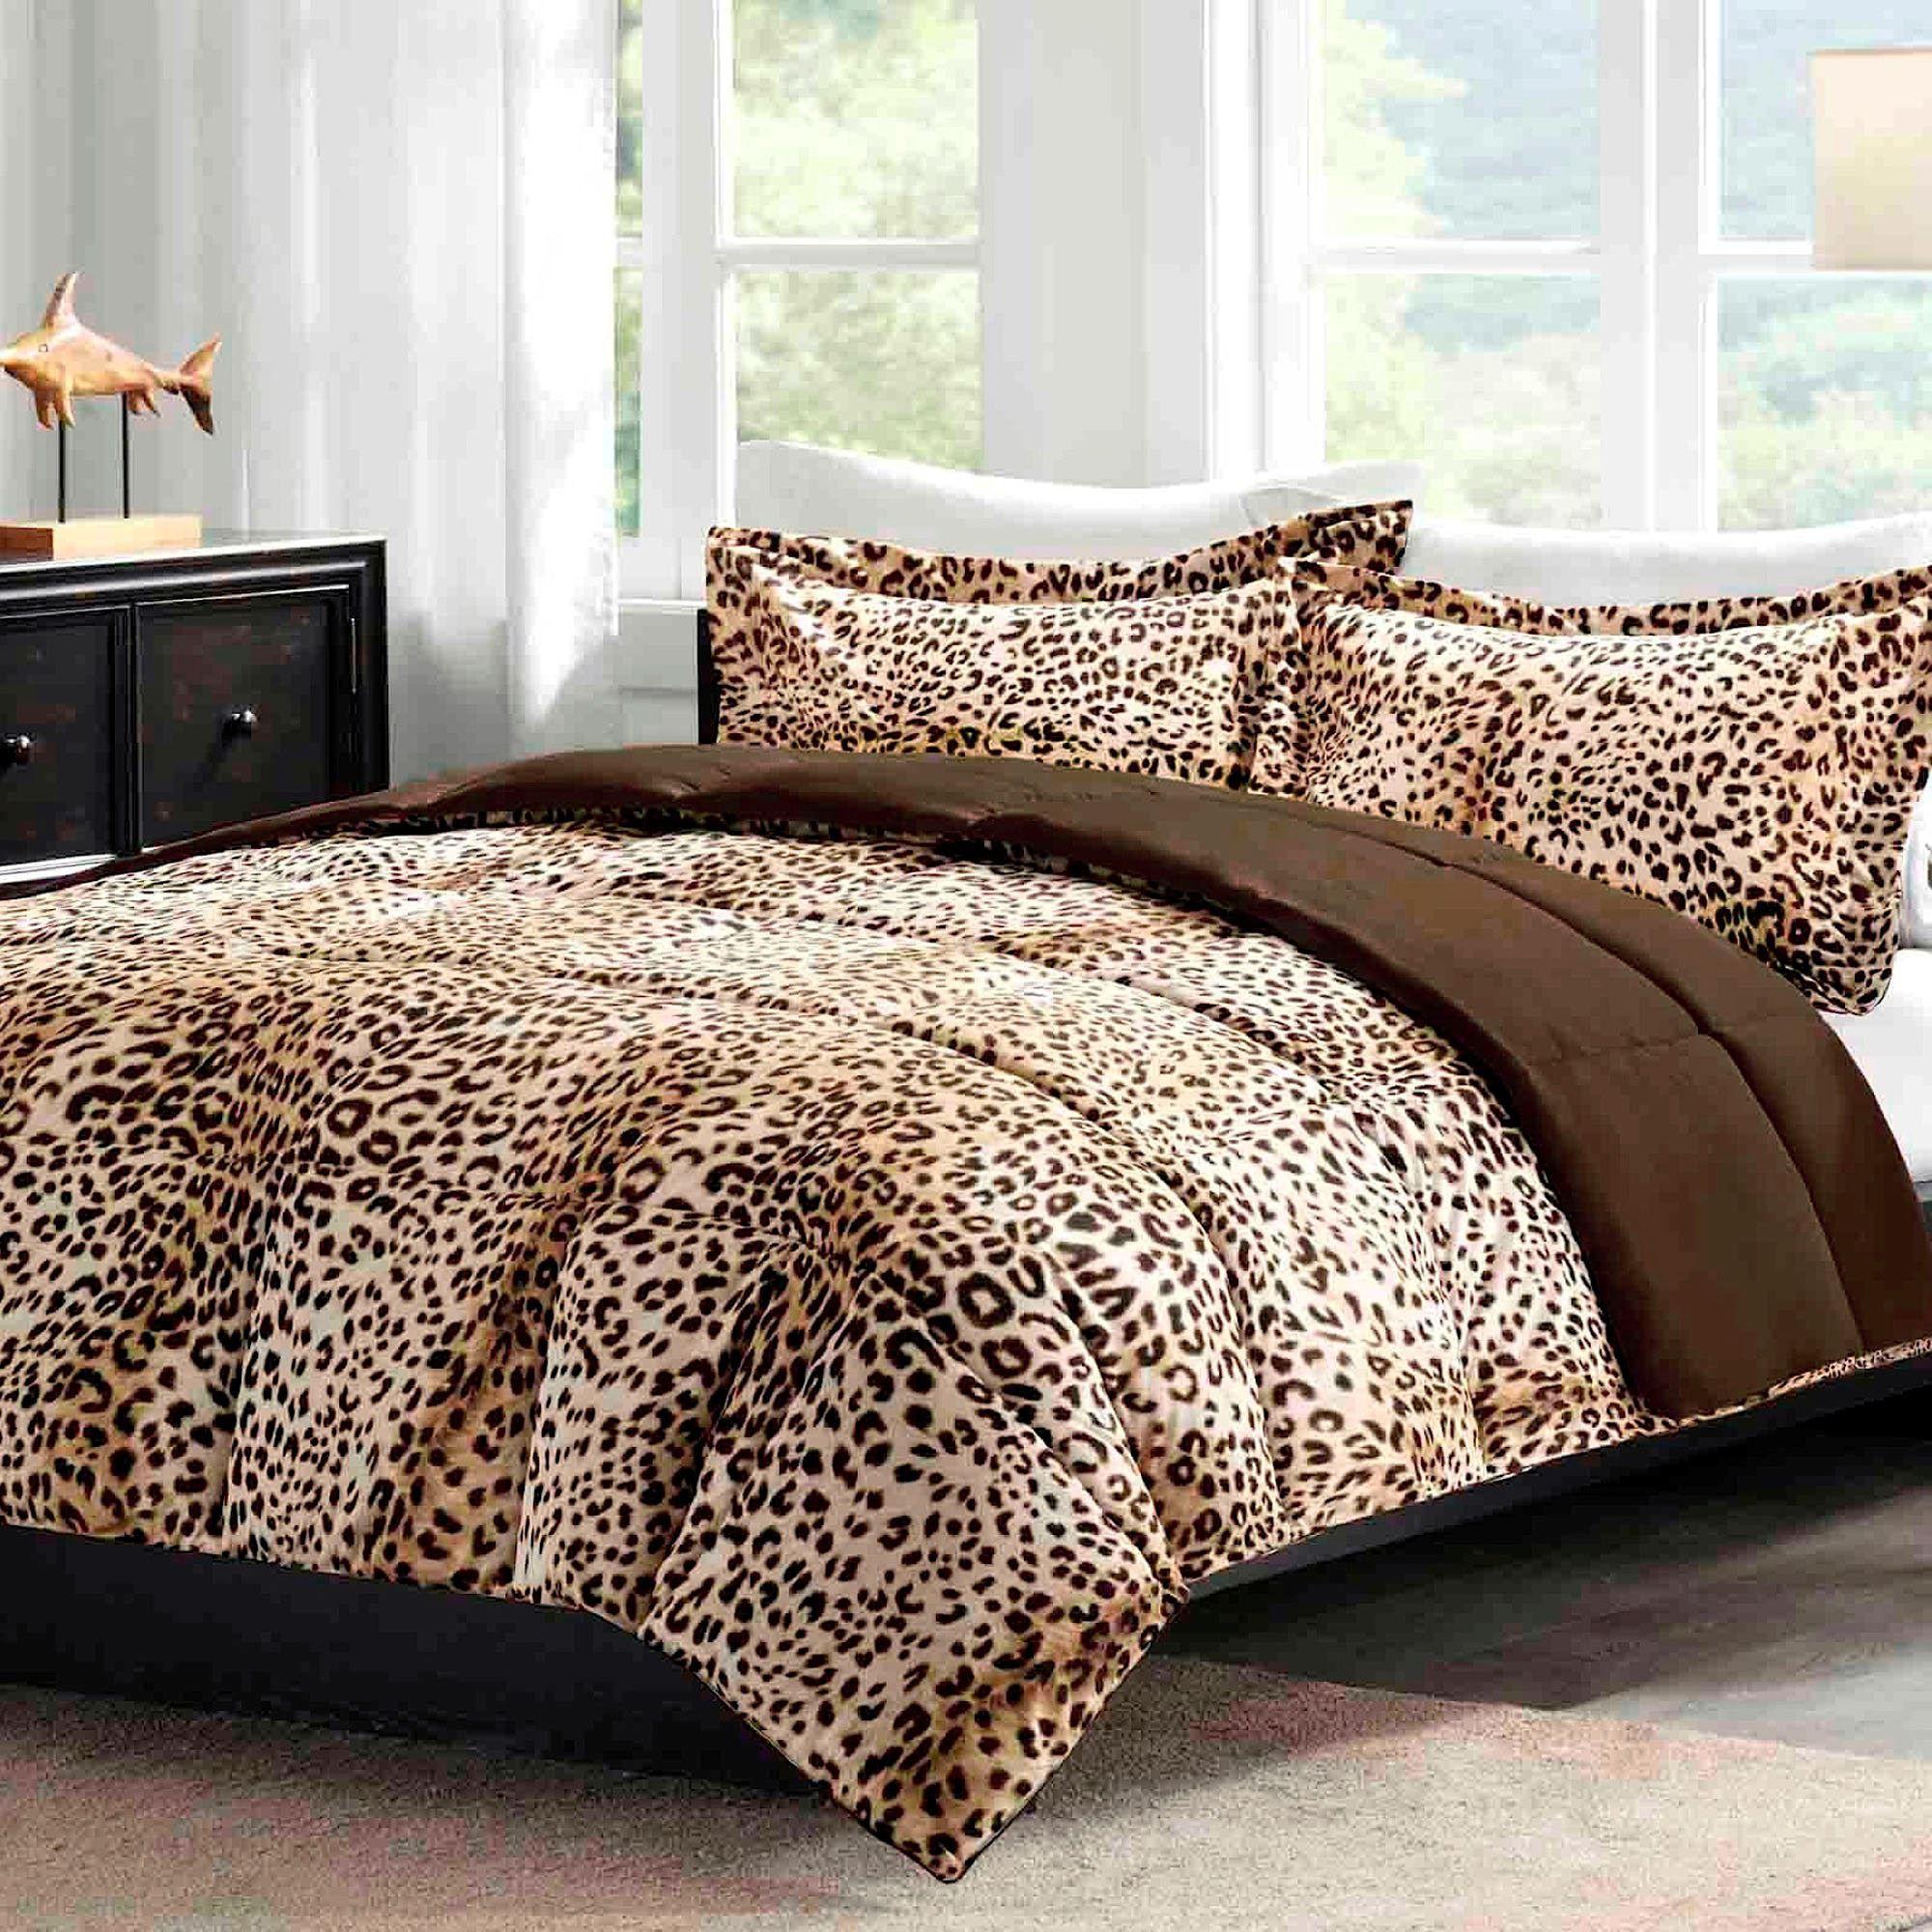 cheetah print bedroom photo - 8